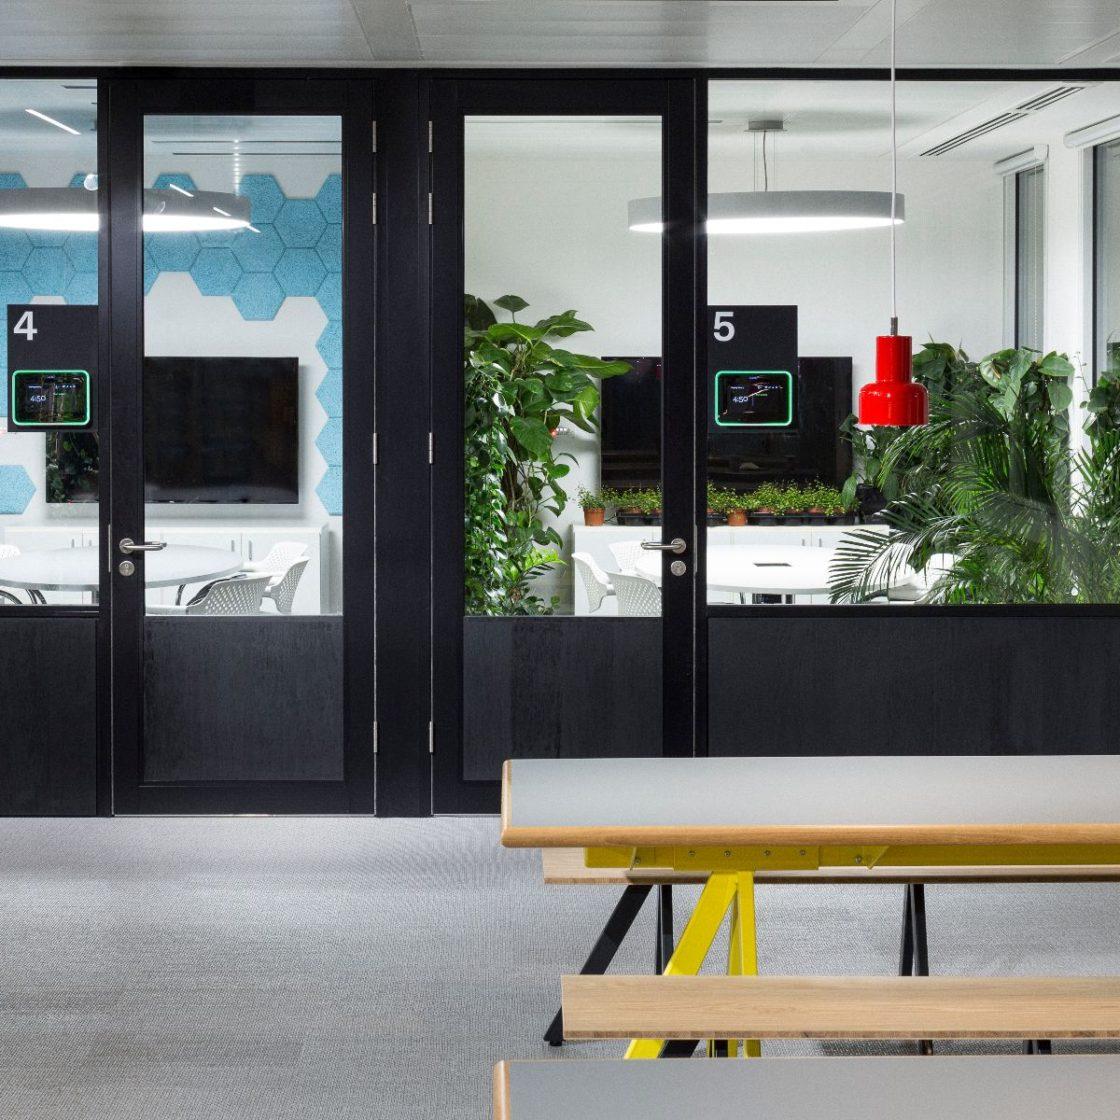 Framed double glazing | framed double doors | acoustics |